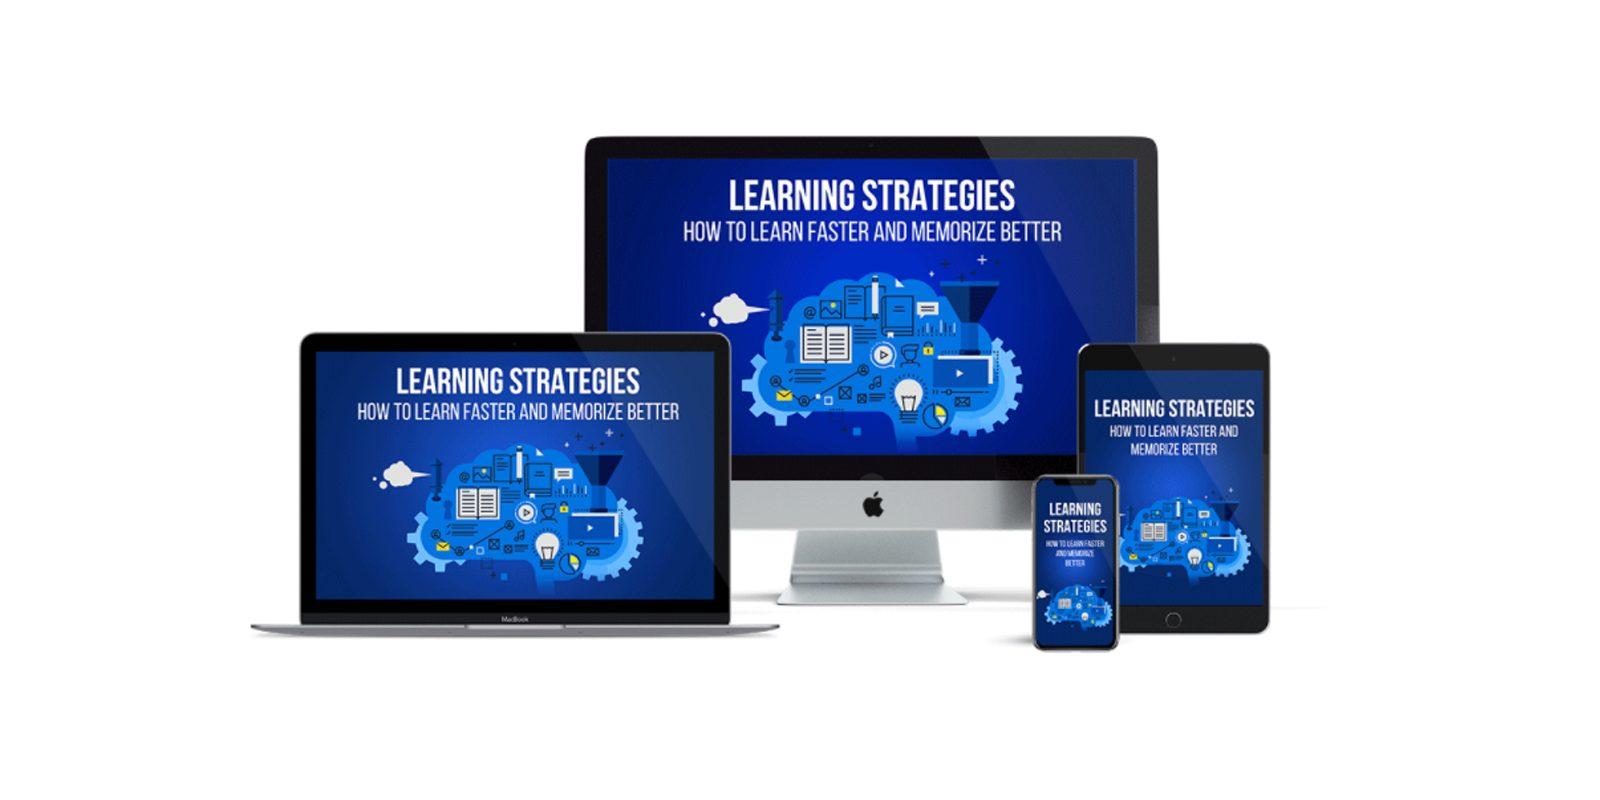 Zenbrain Learning Strategies Review